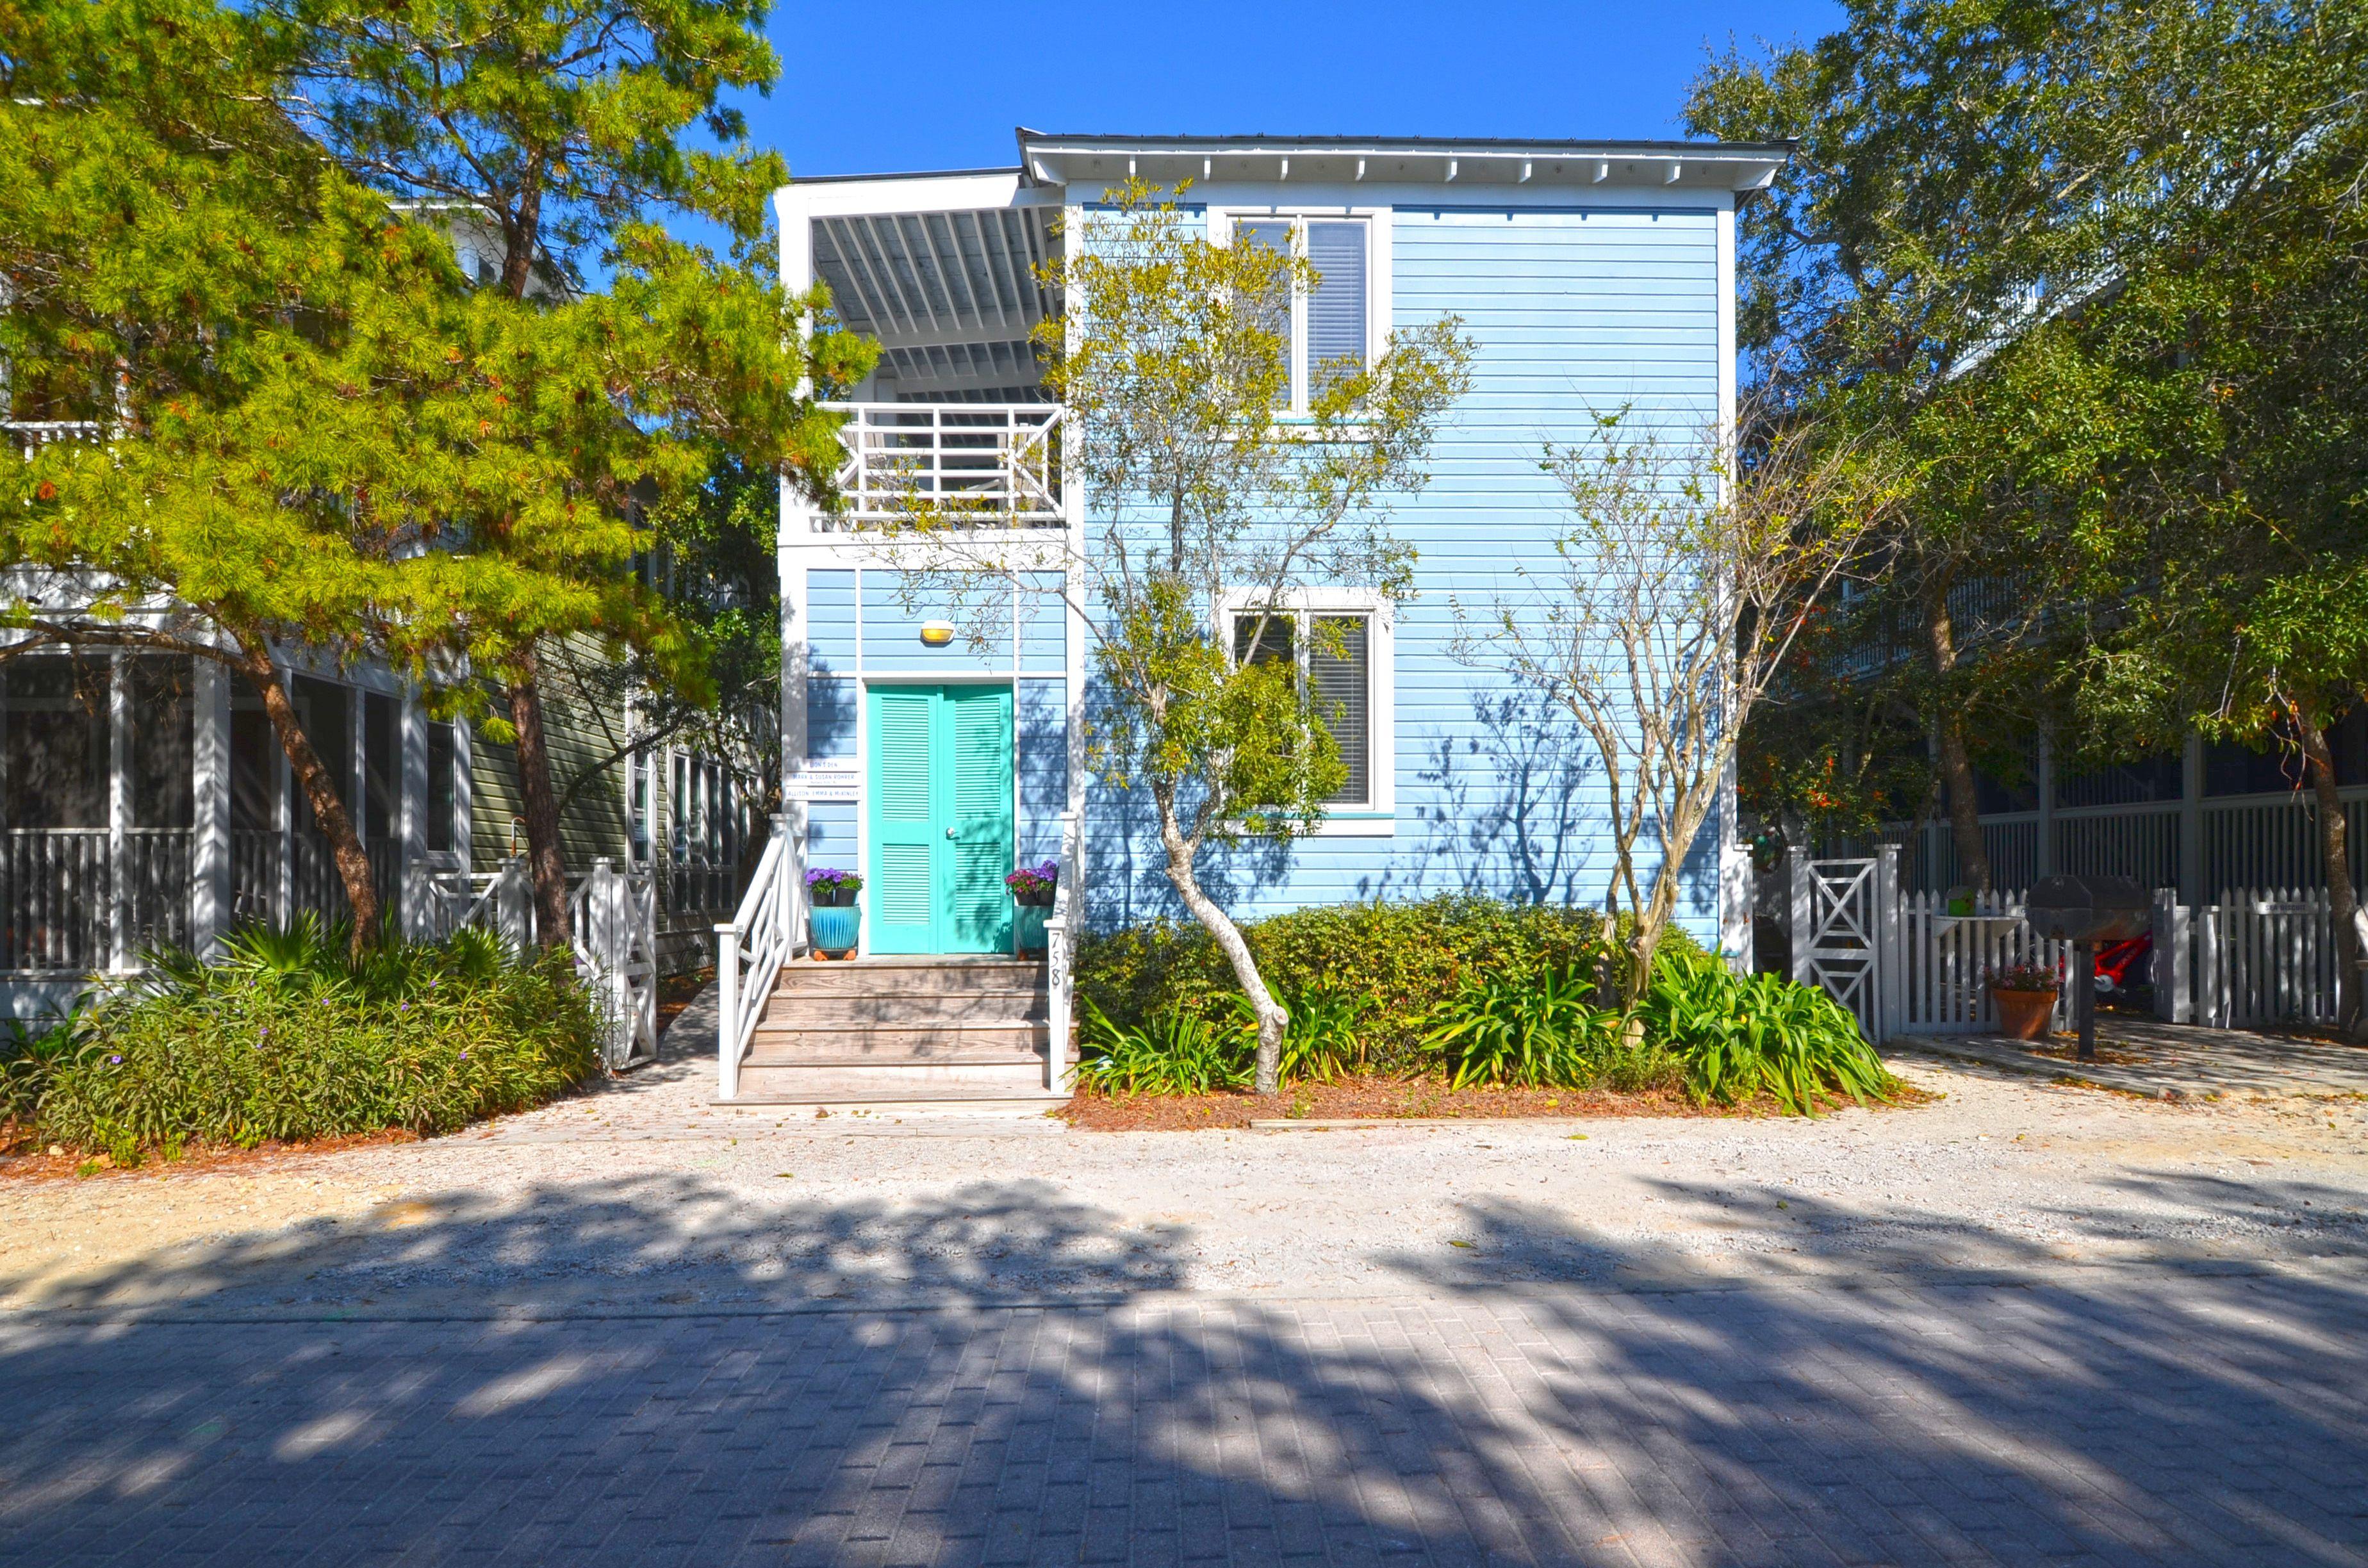 waterfront homes for sale st simons island ga